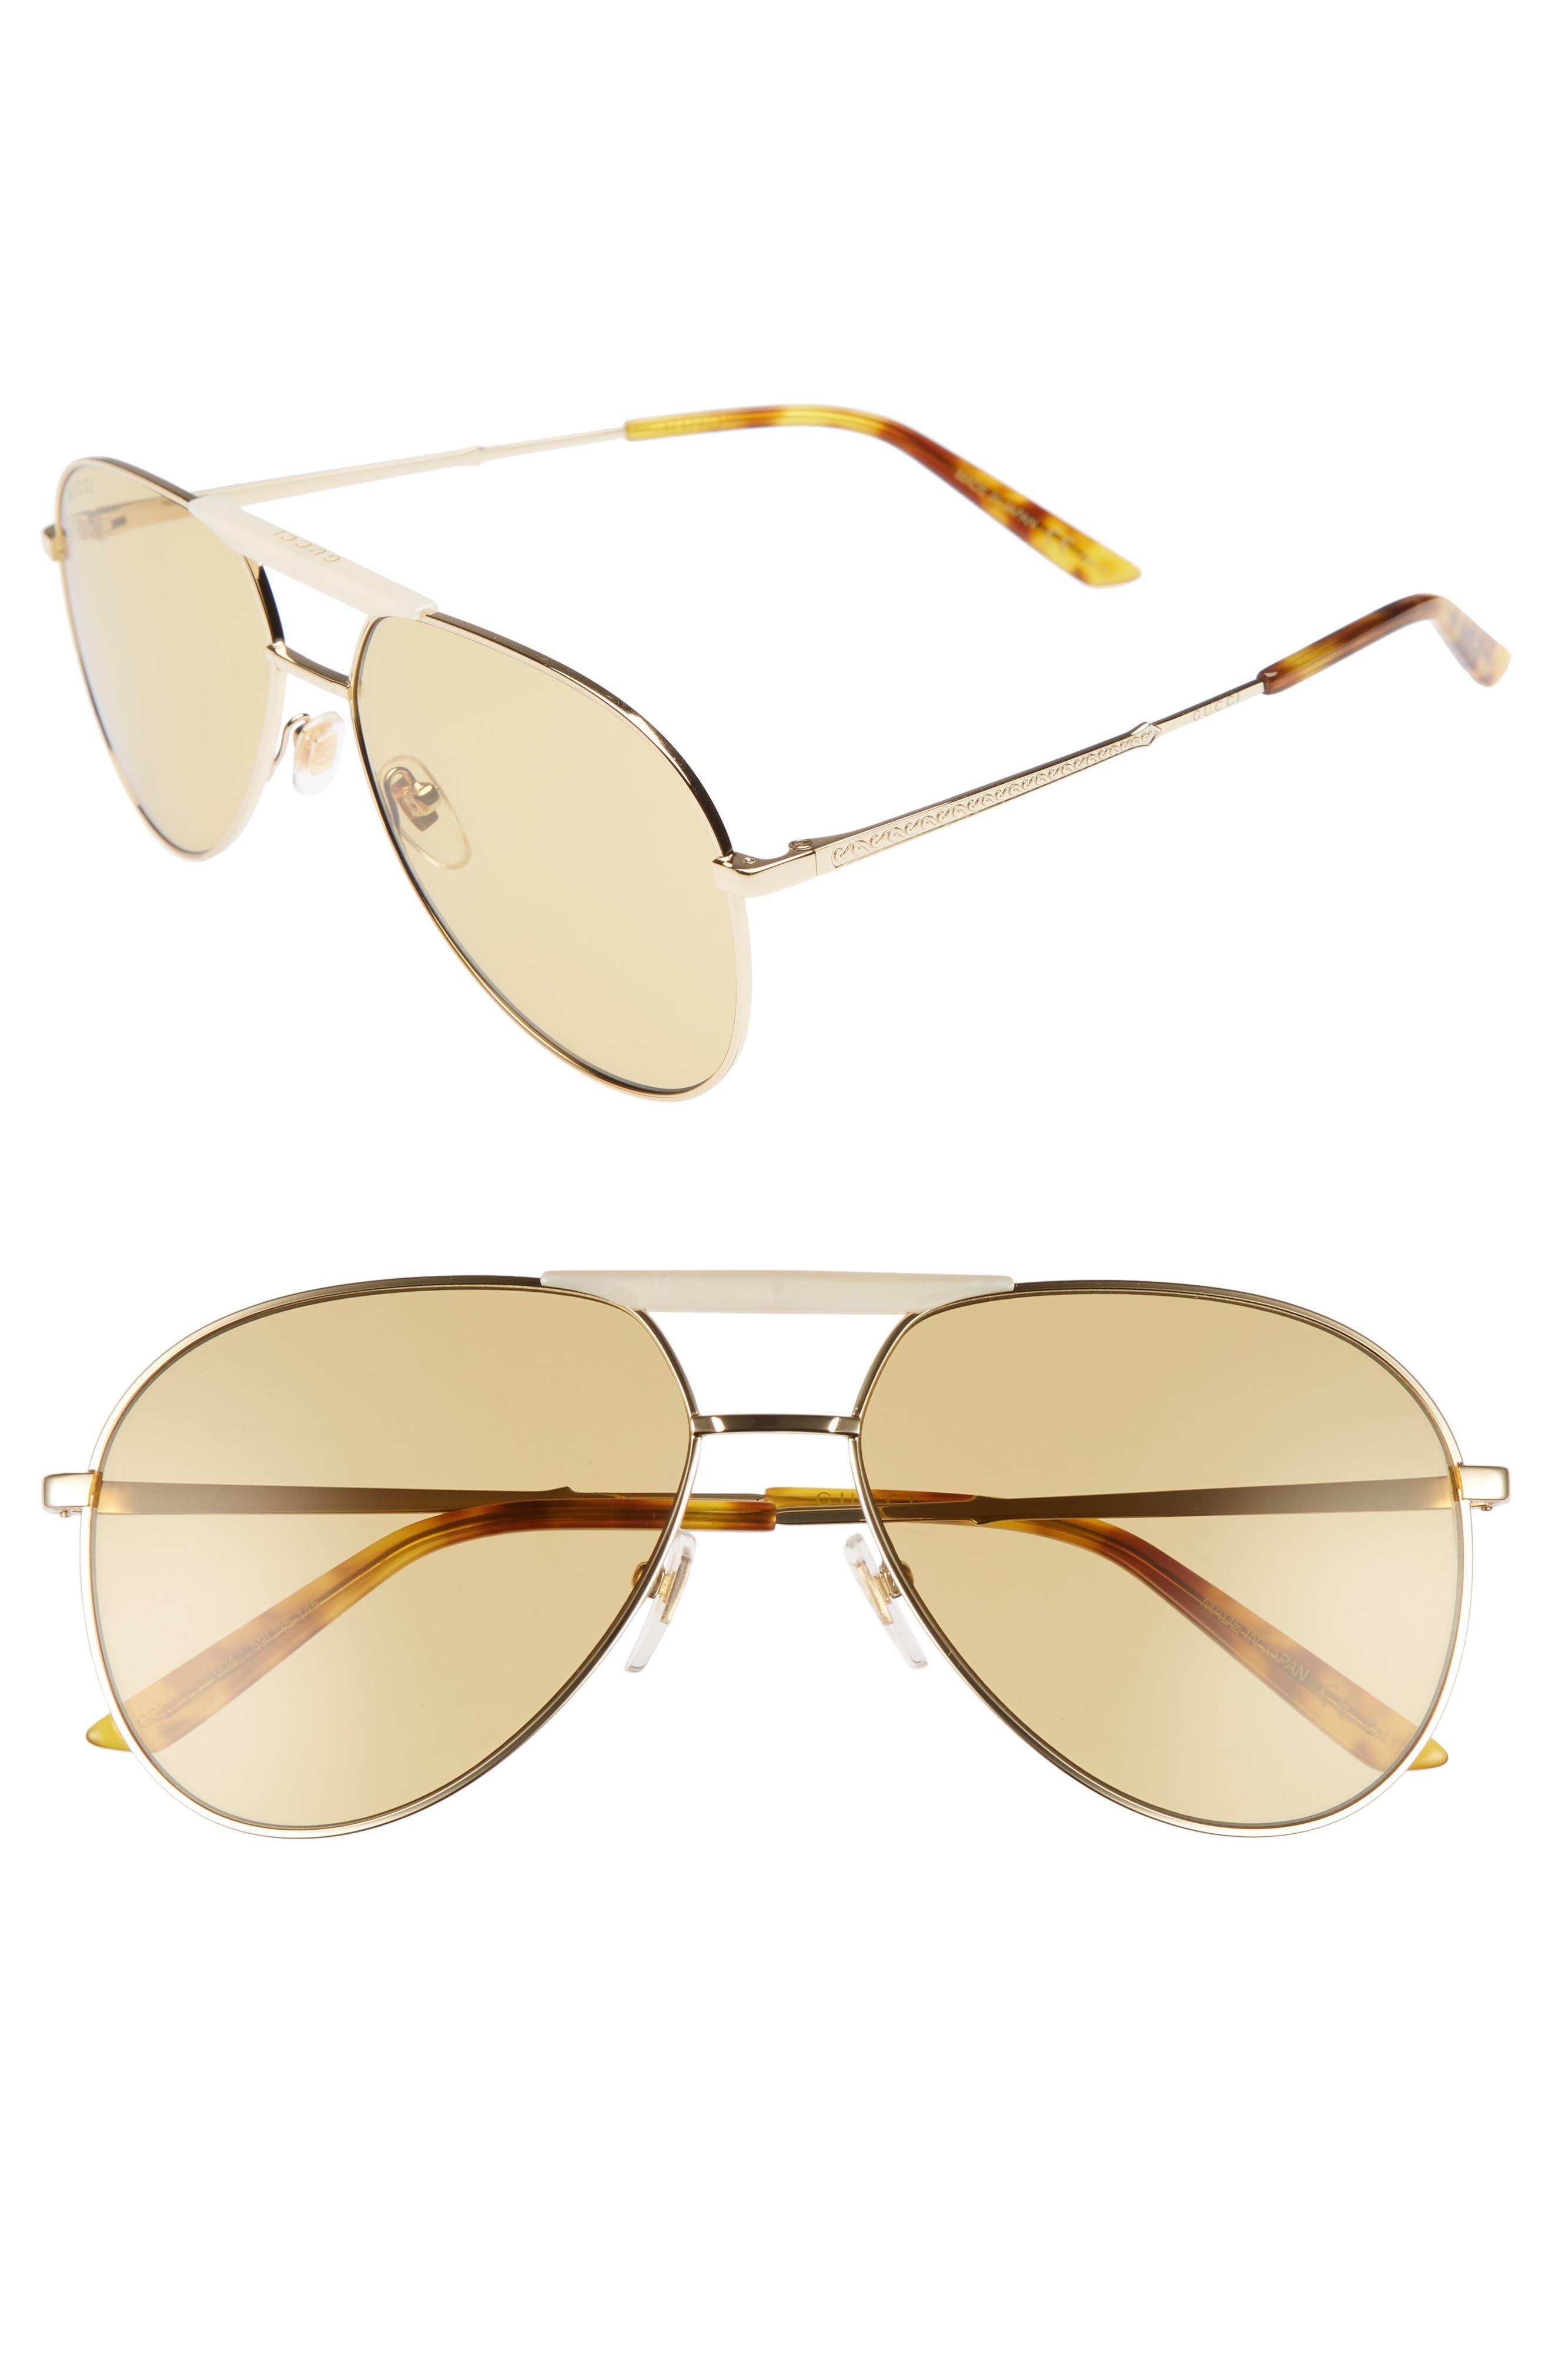 Cruise 59mm Aviator Sunglasses,                         Main,                         color, Gold/ Honey Havana